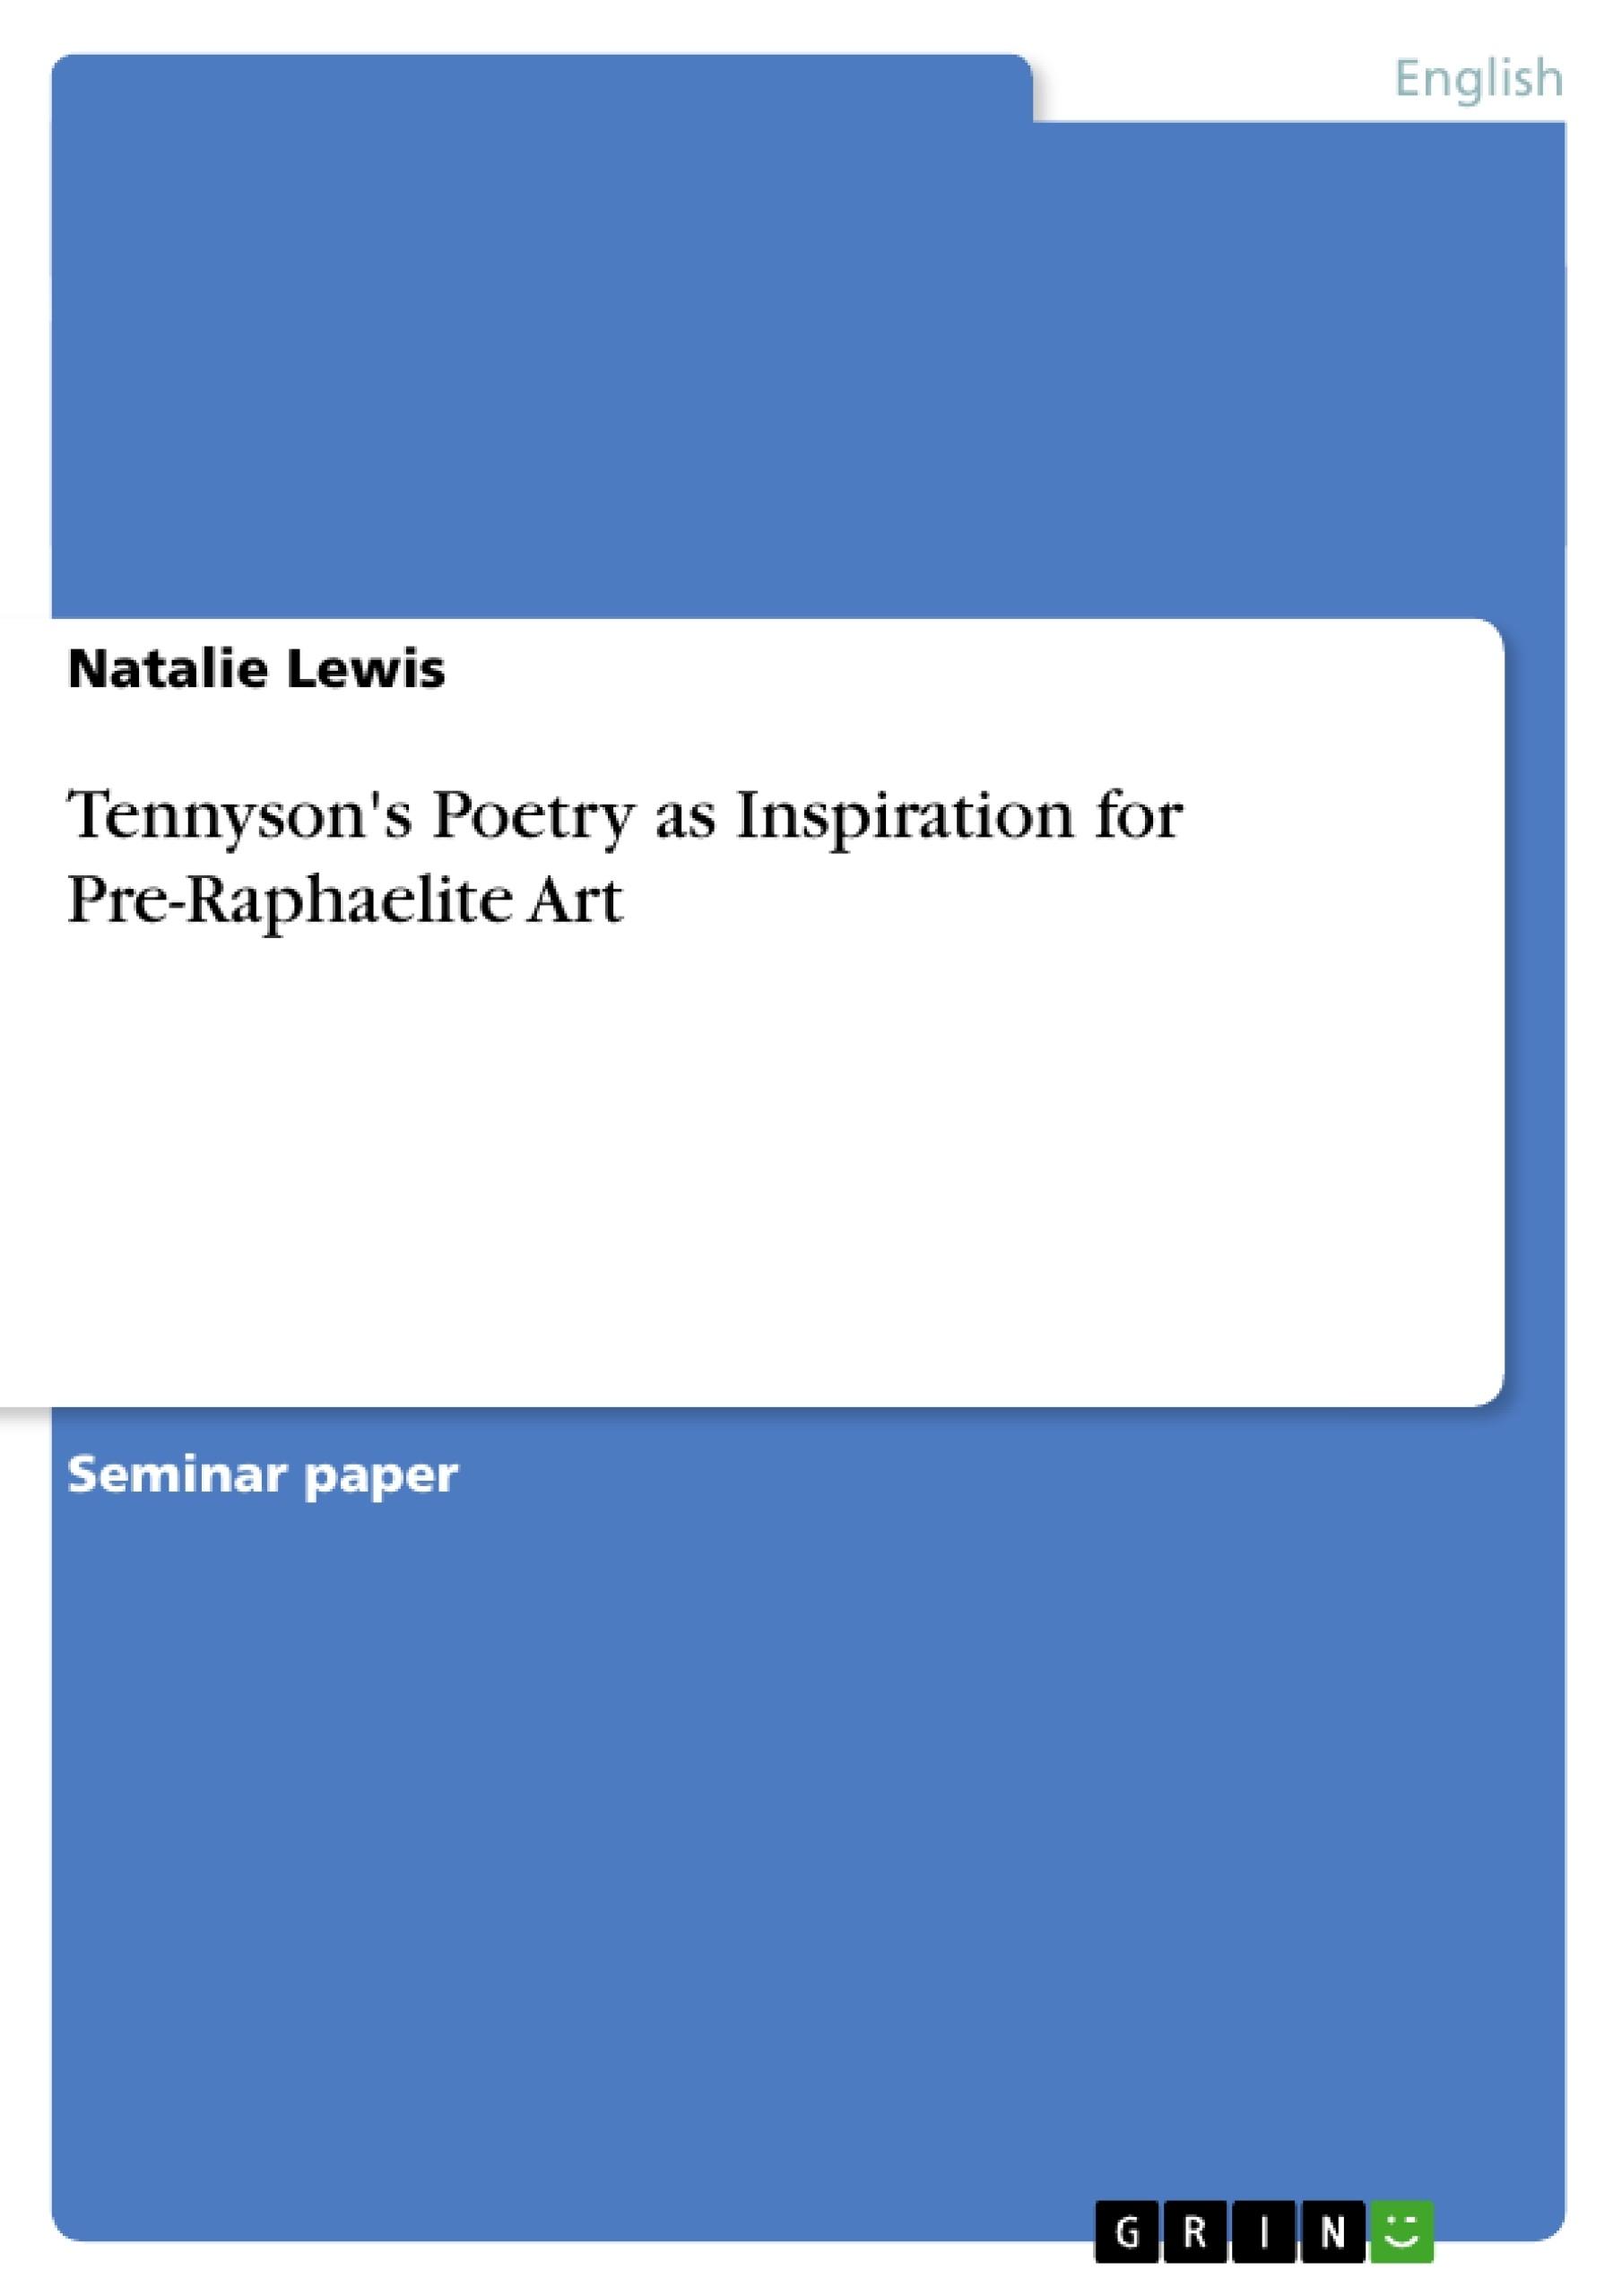 Title: Tennyson's Poetry as Inspiration for Pre-Raphaelite Art